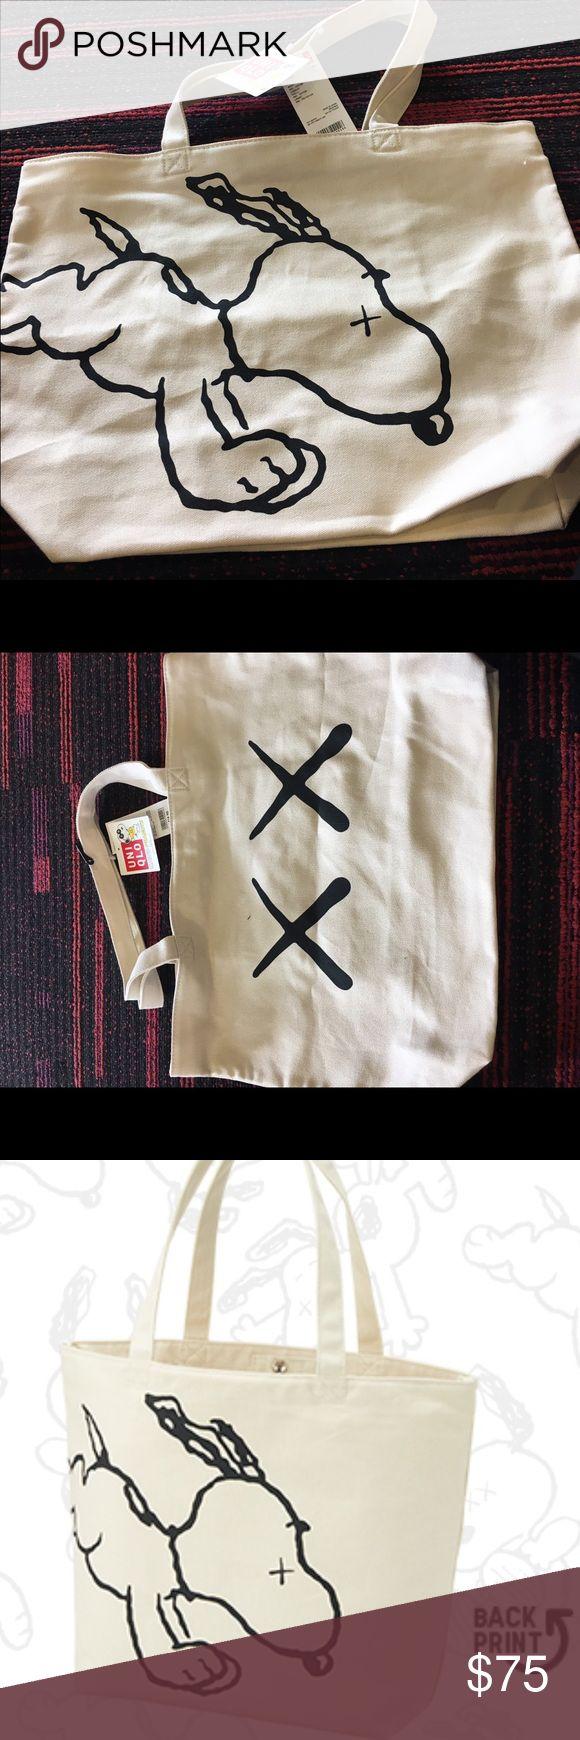 KAWS X Snoopy Tote bag Medium size brand new tote bag Uniqlo Bags